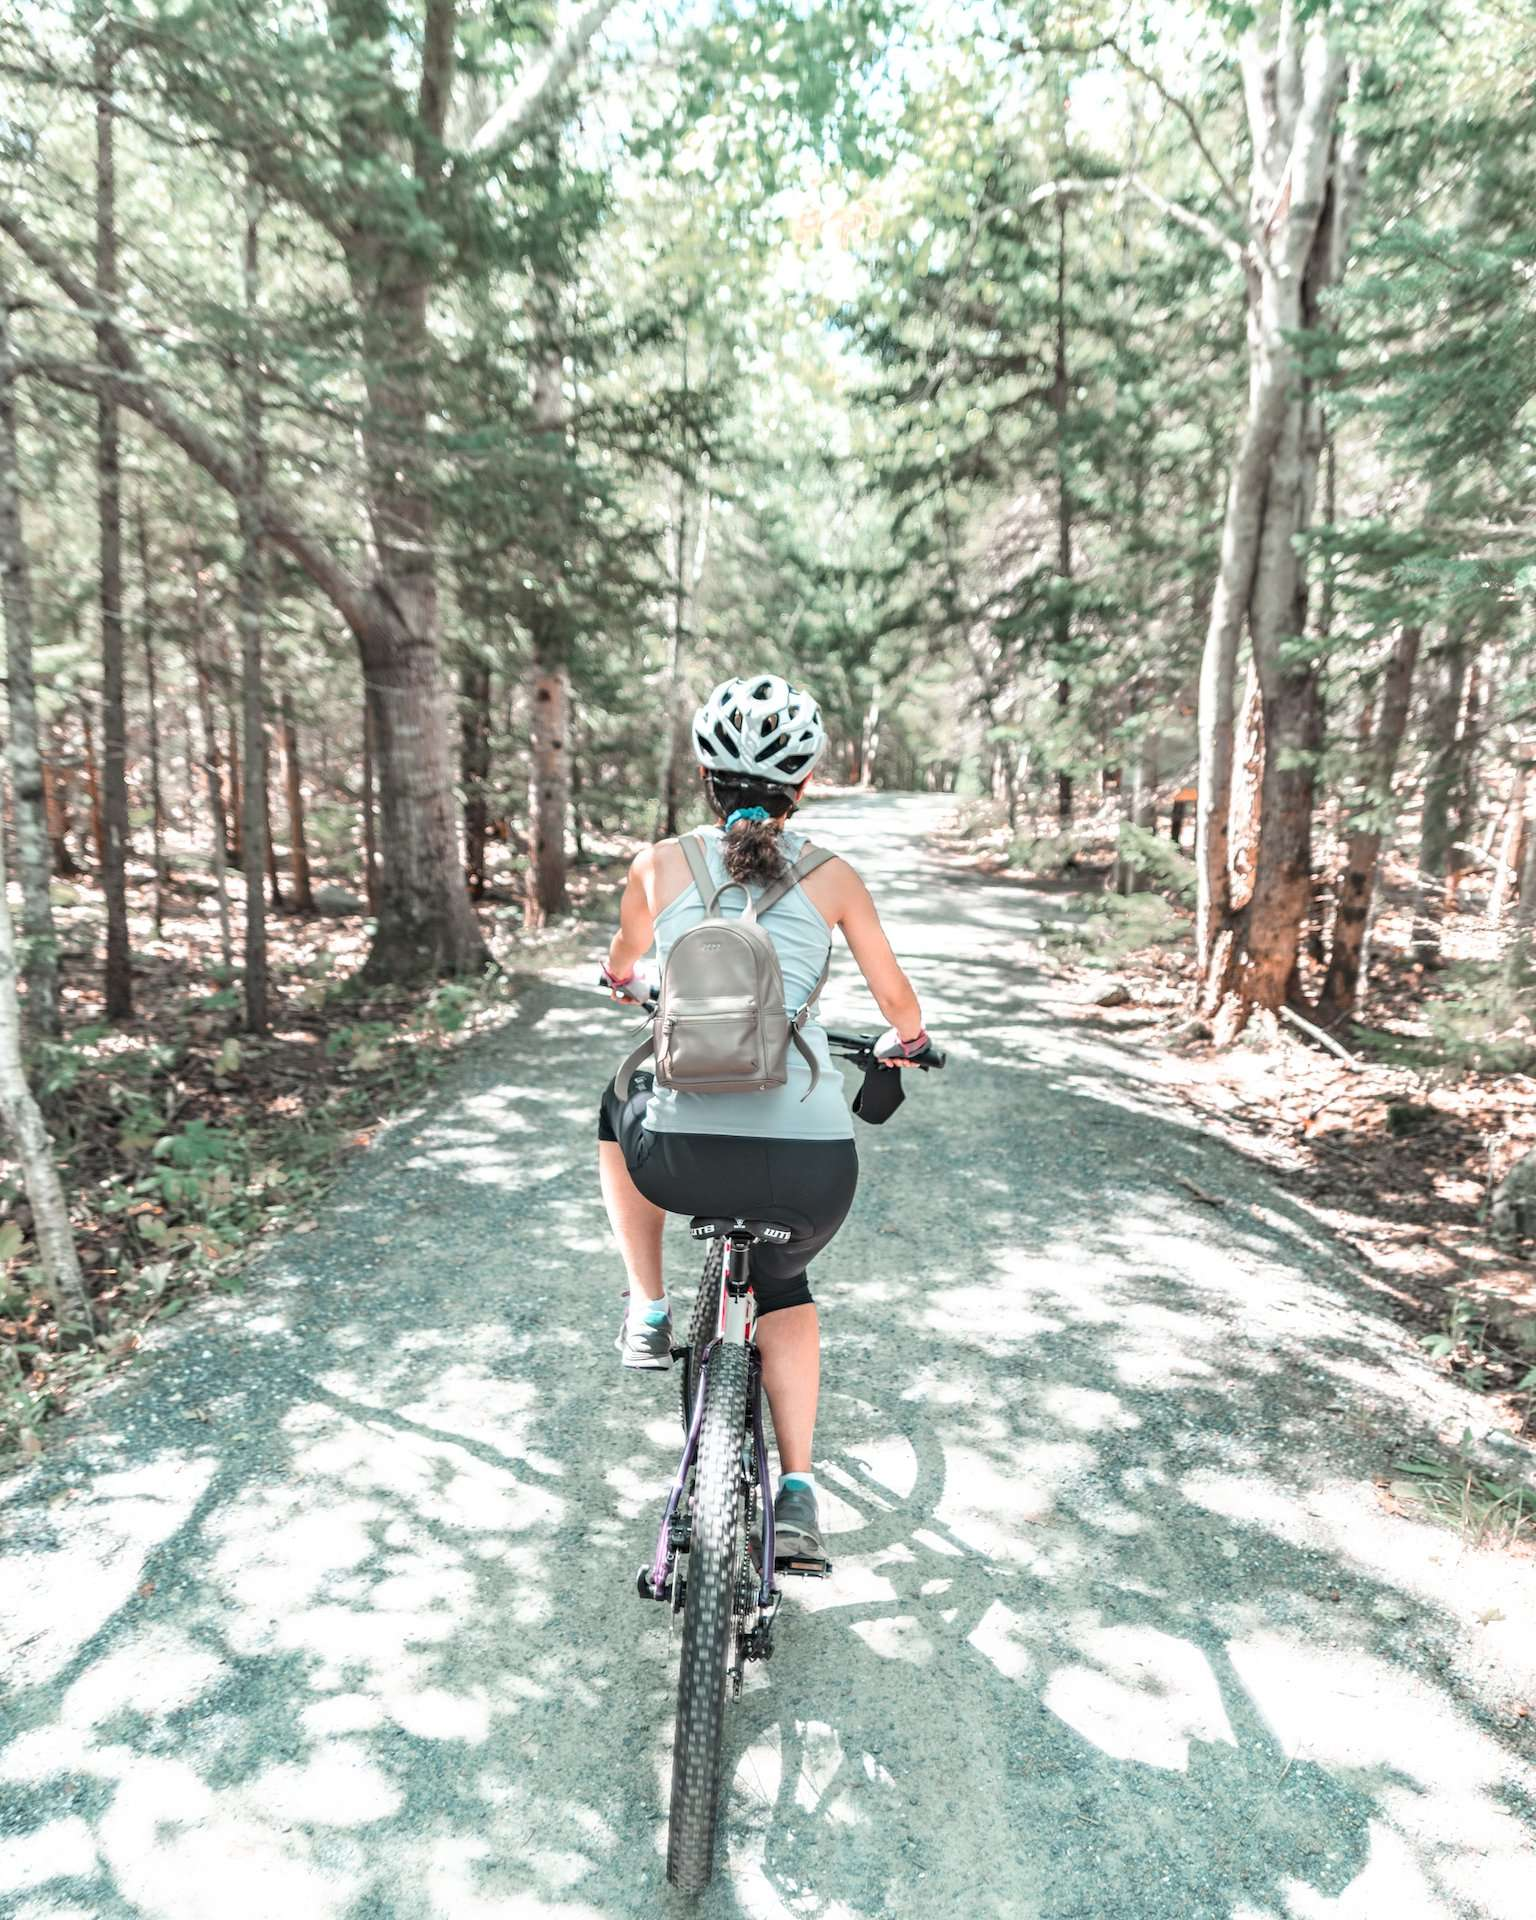 biking carriage roads at Acadia National Park